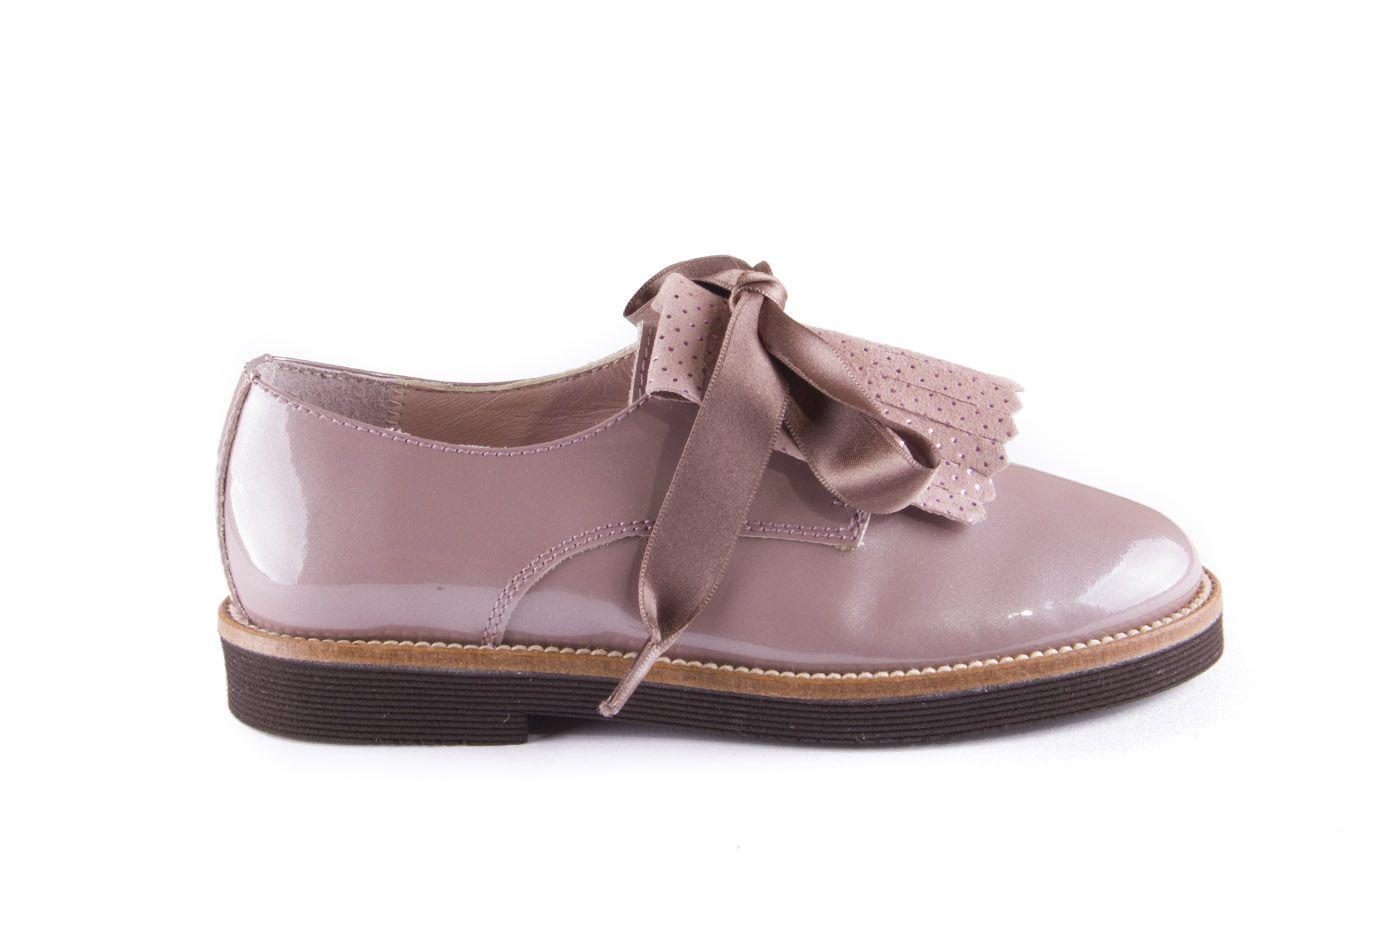 d9e0a5f75 Comprar zapato tipo JOVEN NIÑA estilo BLUCHER COLOR ROSA CHAROL ...